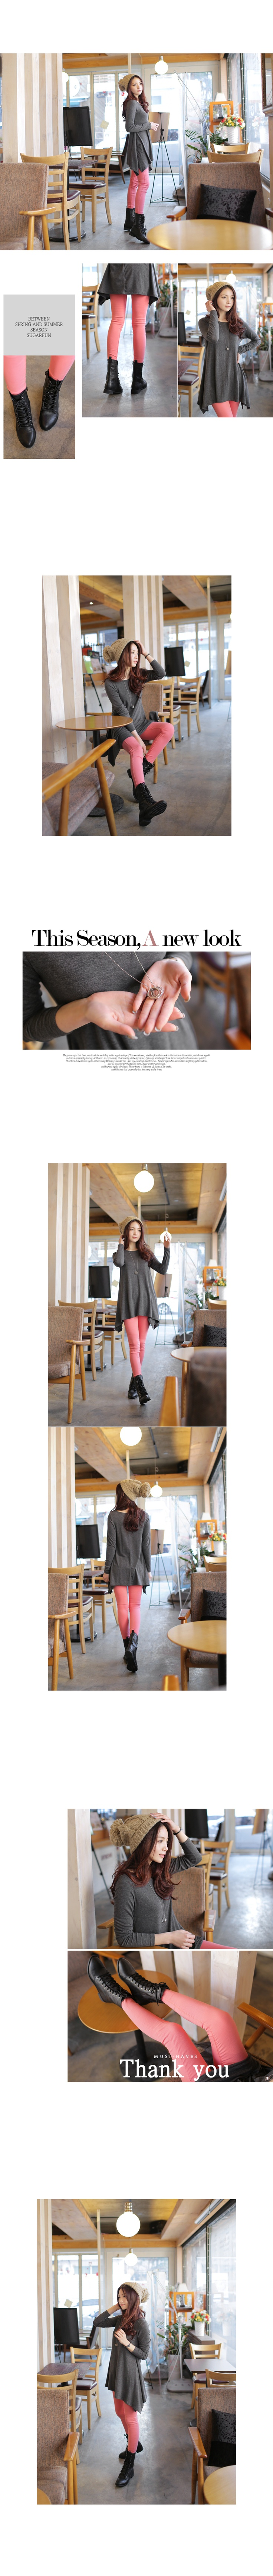 Jual jeans Korea Buy Sell Authentic Korean Skirt Fashion Online Sugarfun Skinny Jeans LFBTM_078_1248 $95 #malaysianbabes #malaysianshopper #malaysiashopper #malaysiashopping #malaysianshopping #onlineshop #onlineshopping #sggirls #koreafashion #koreanfashion #fashion #pikomiko #shoppingspree #spree #poslaju #posmalaysia #malaysiashop